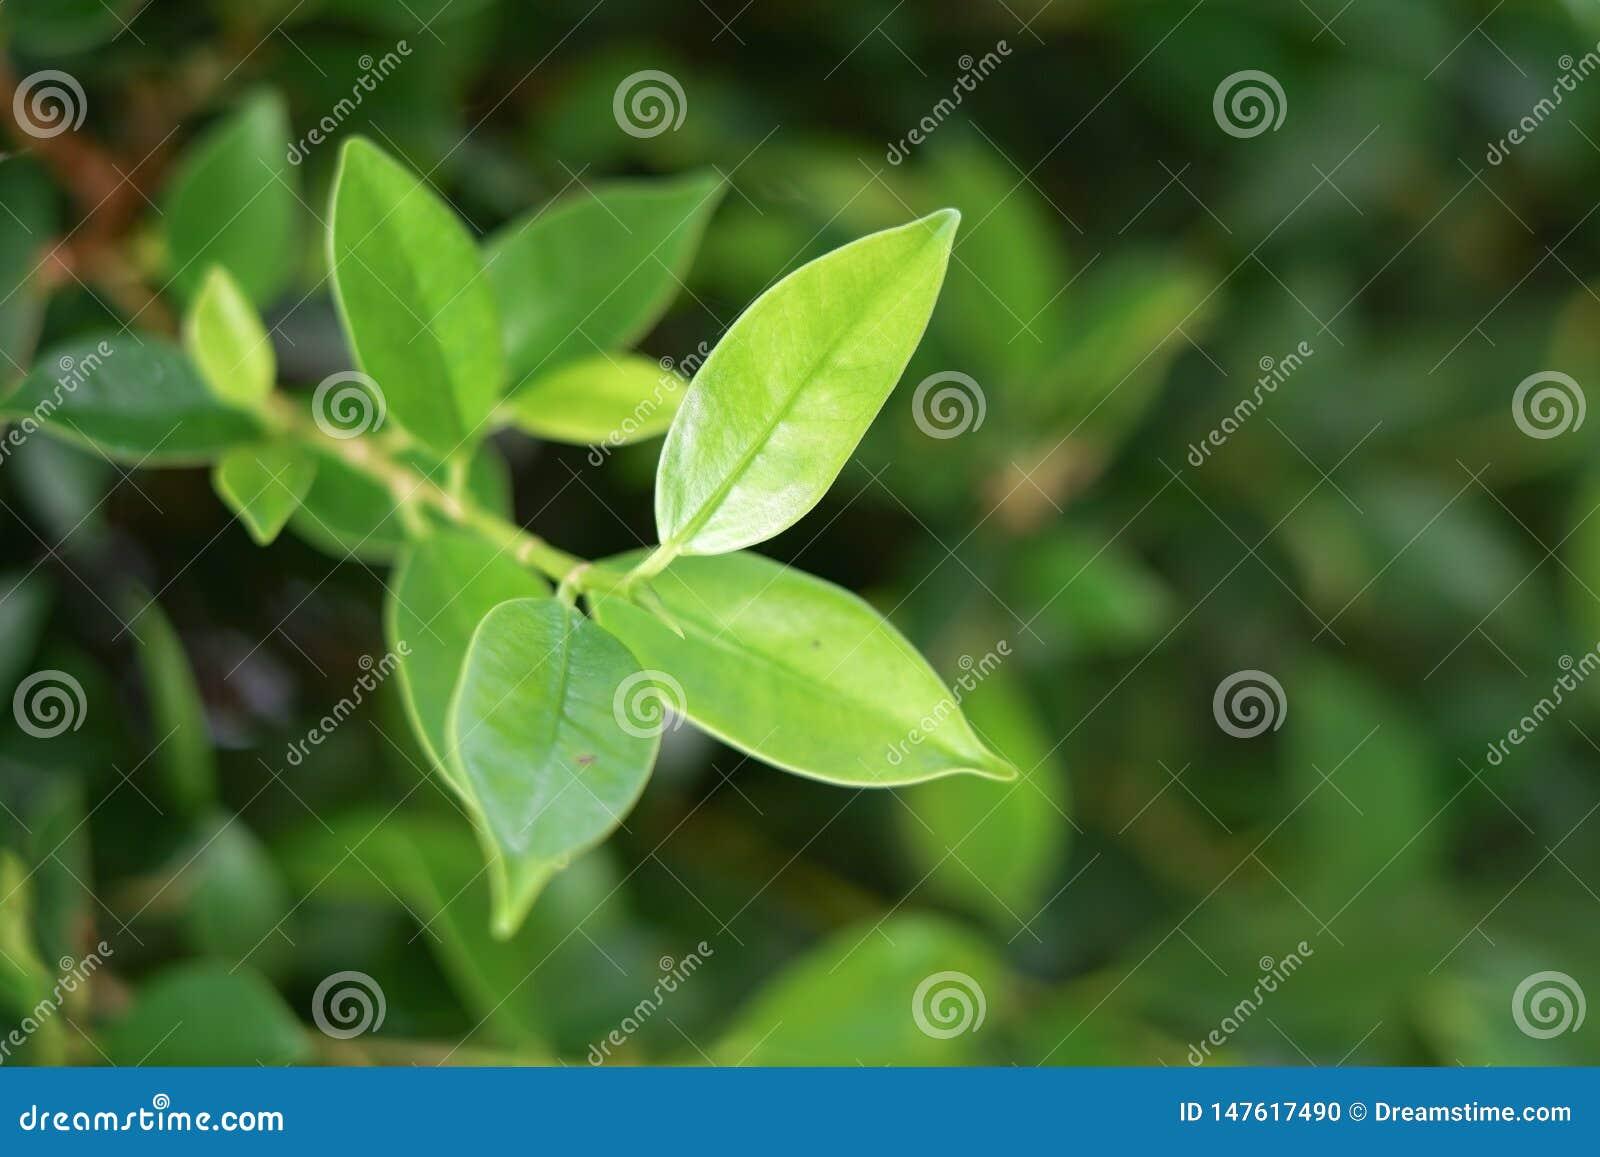 Folha, folhas, verde, fundo, branco, natureza